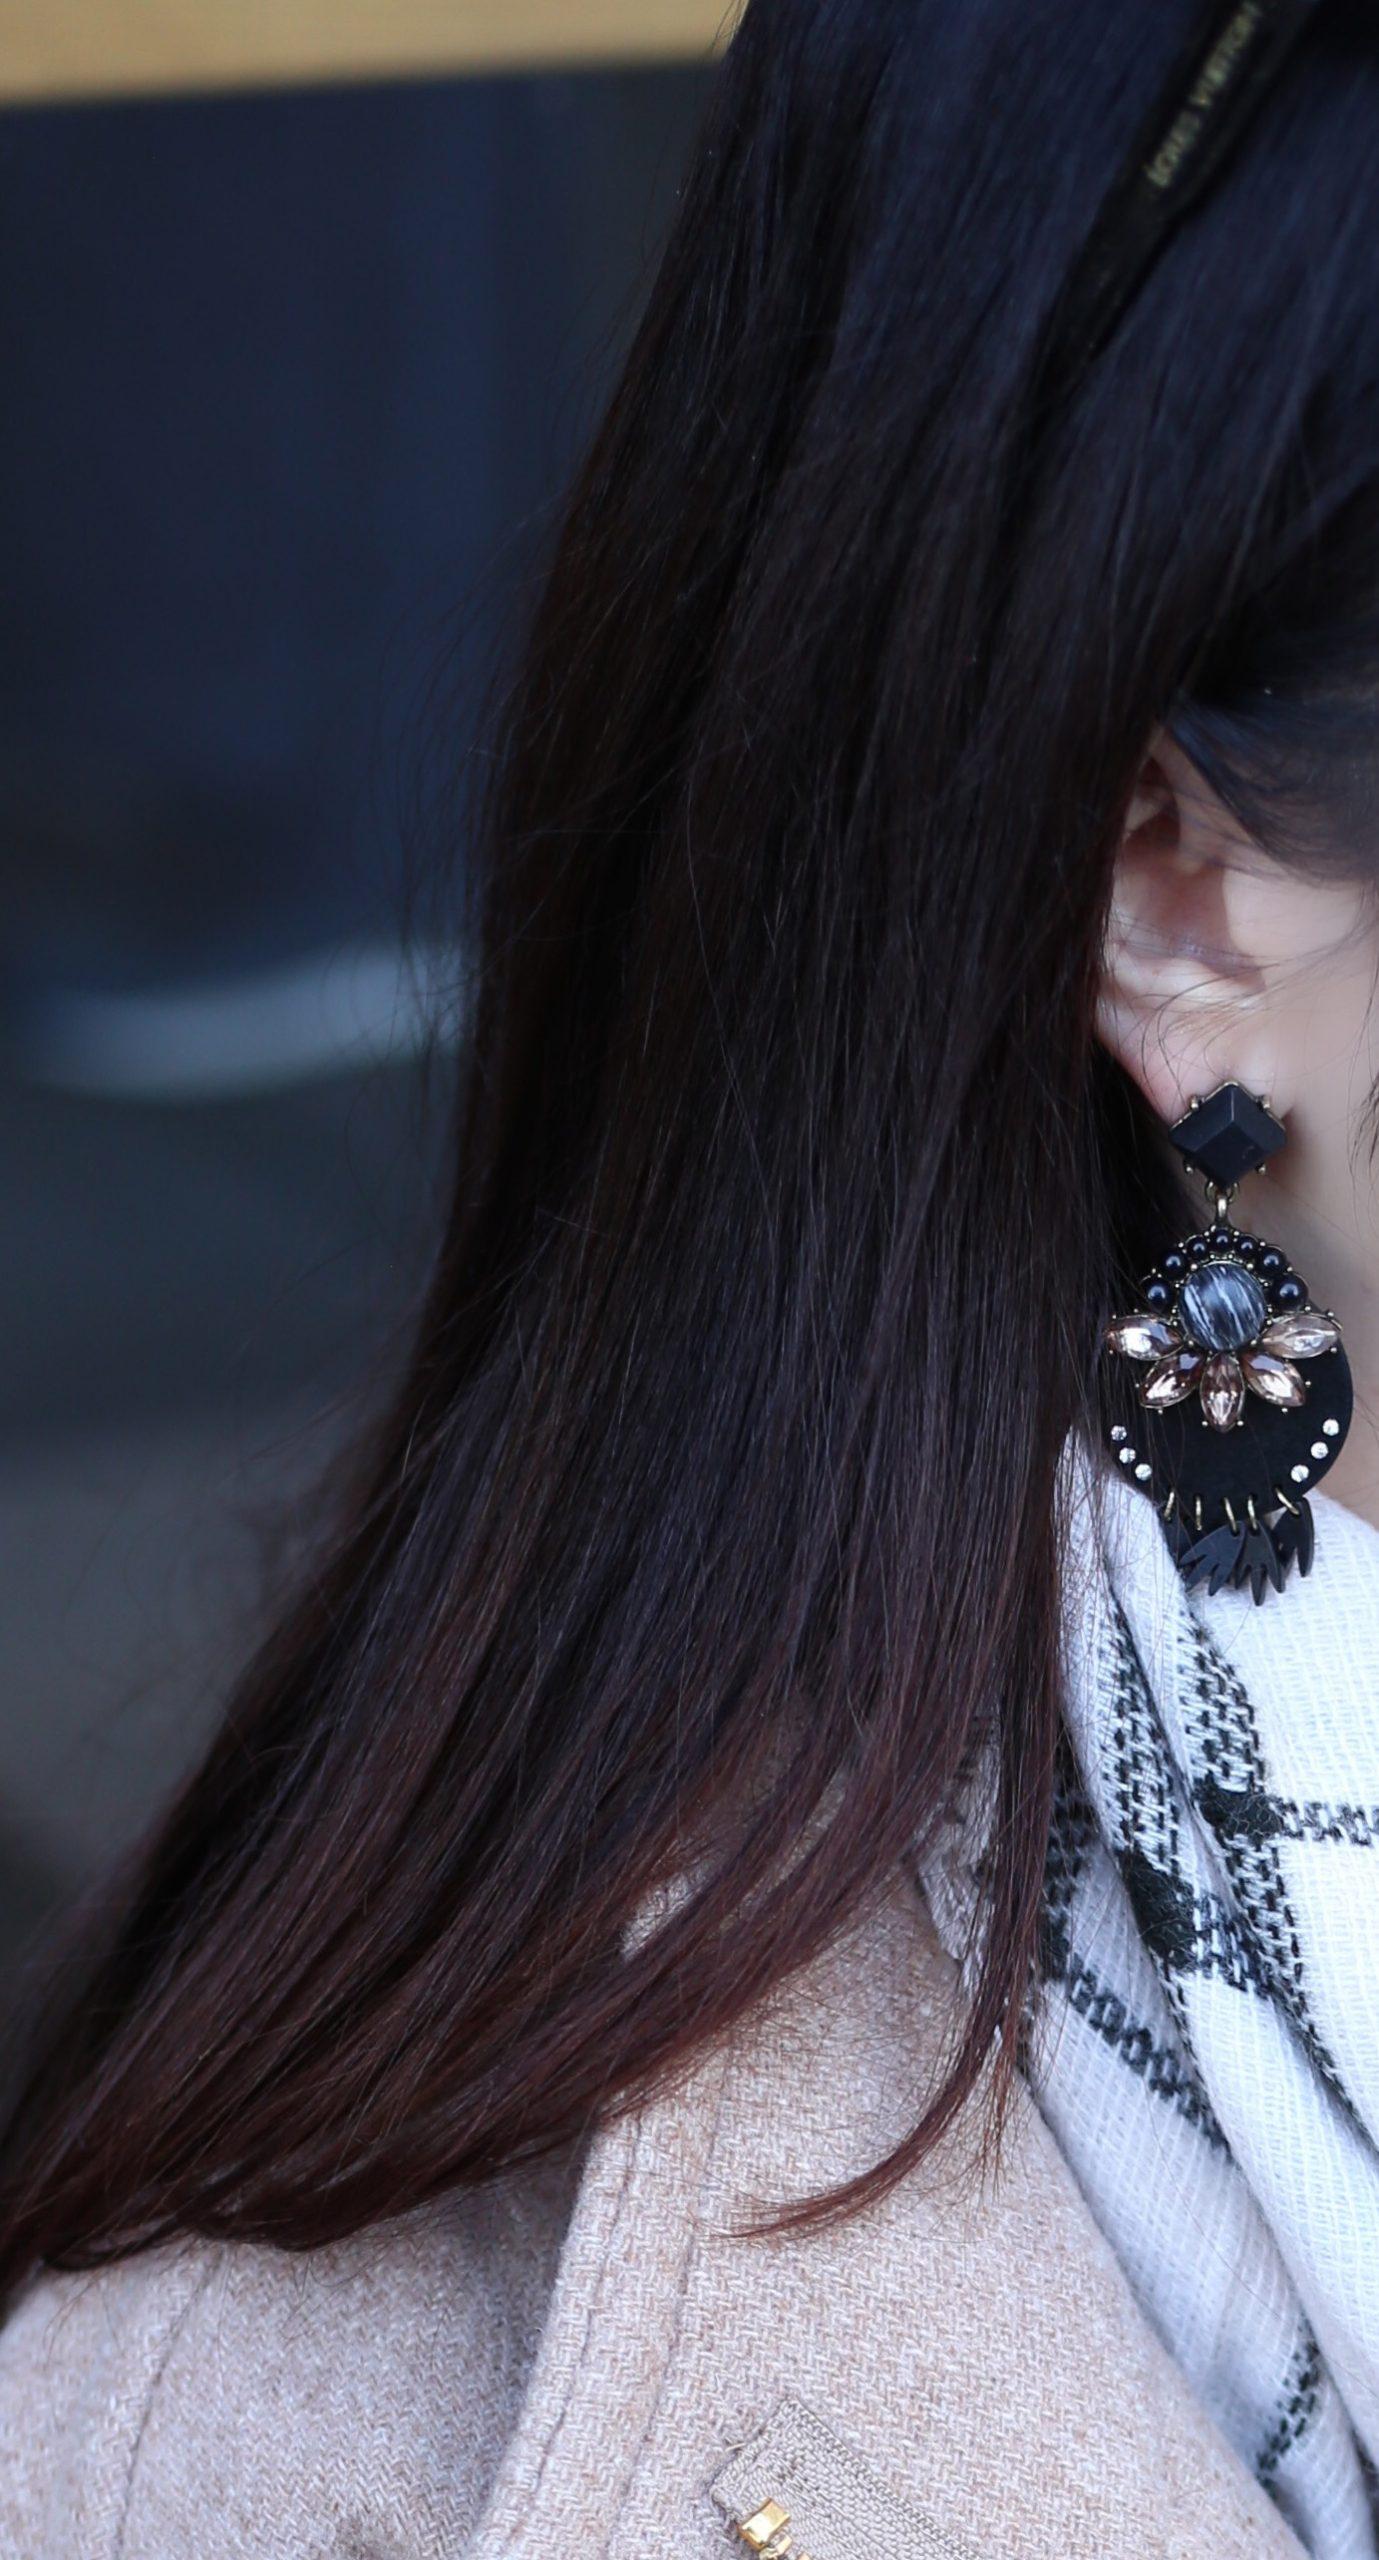 blogger Anna Monteiro of Blushing Rose Style wearing BaubleBar Venette Drop earrings